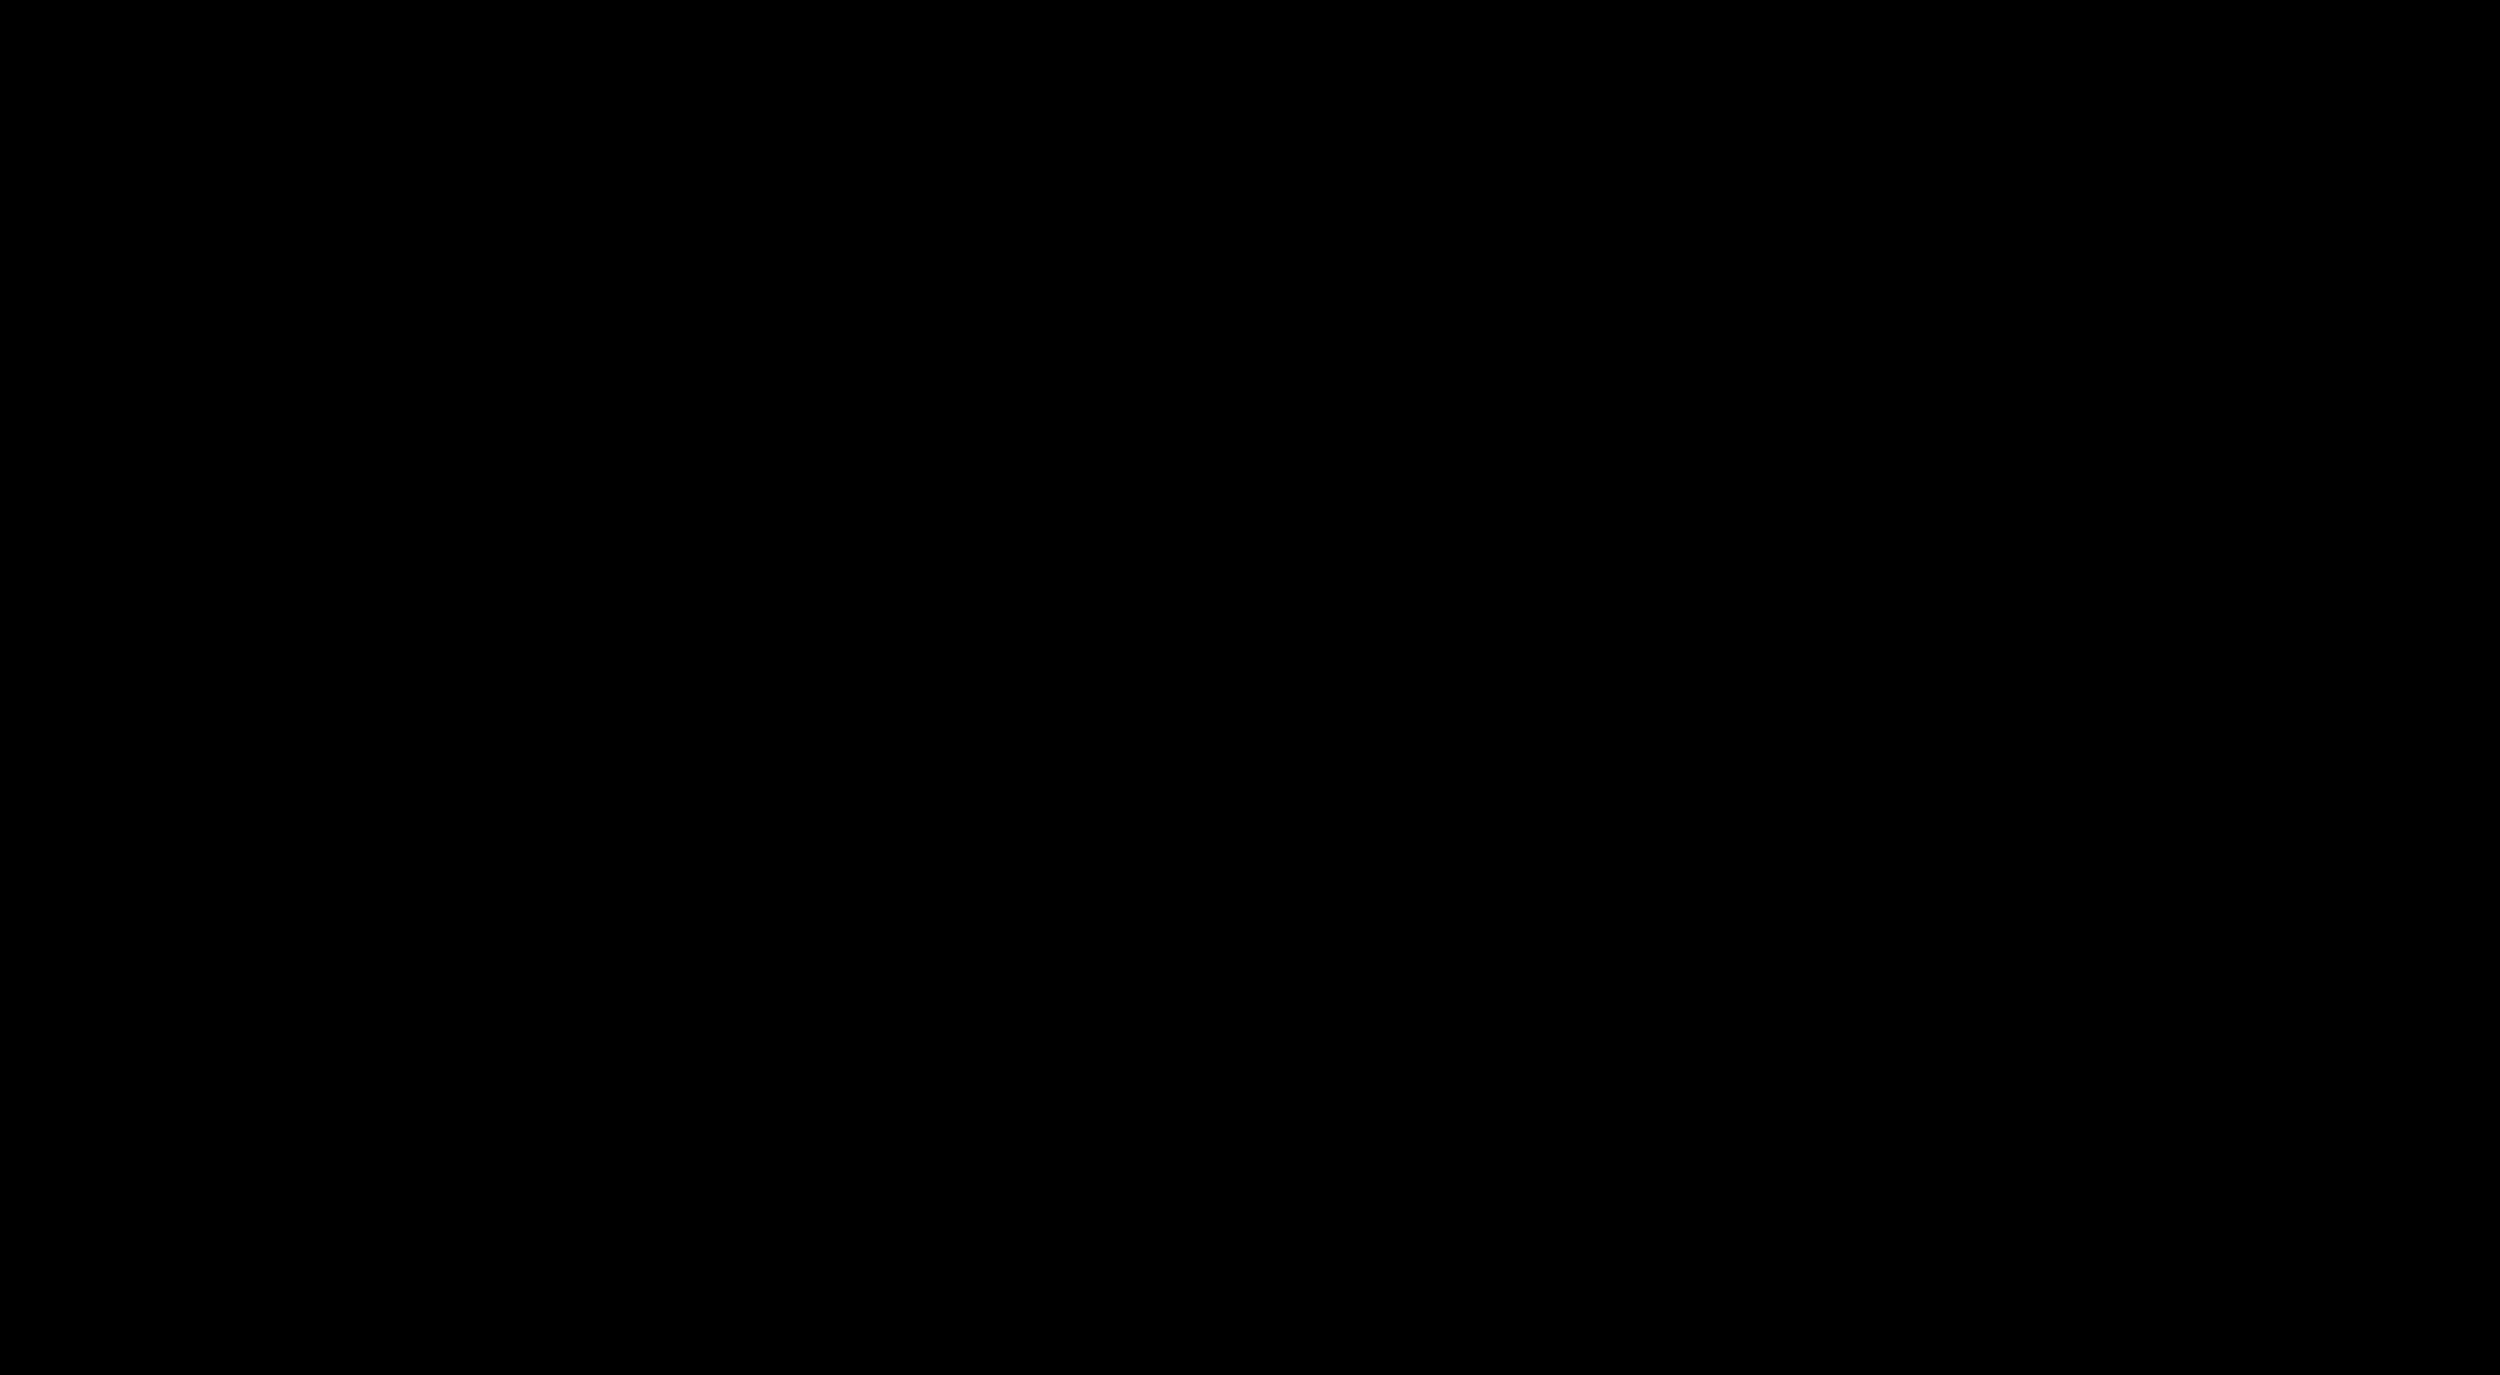 PFJ black logo small.png